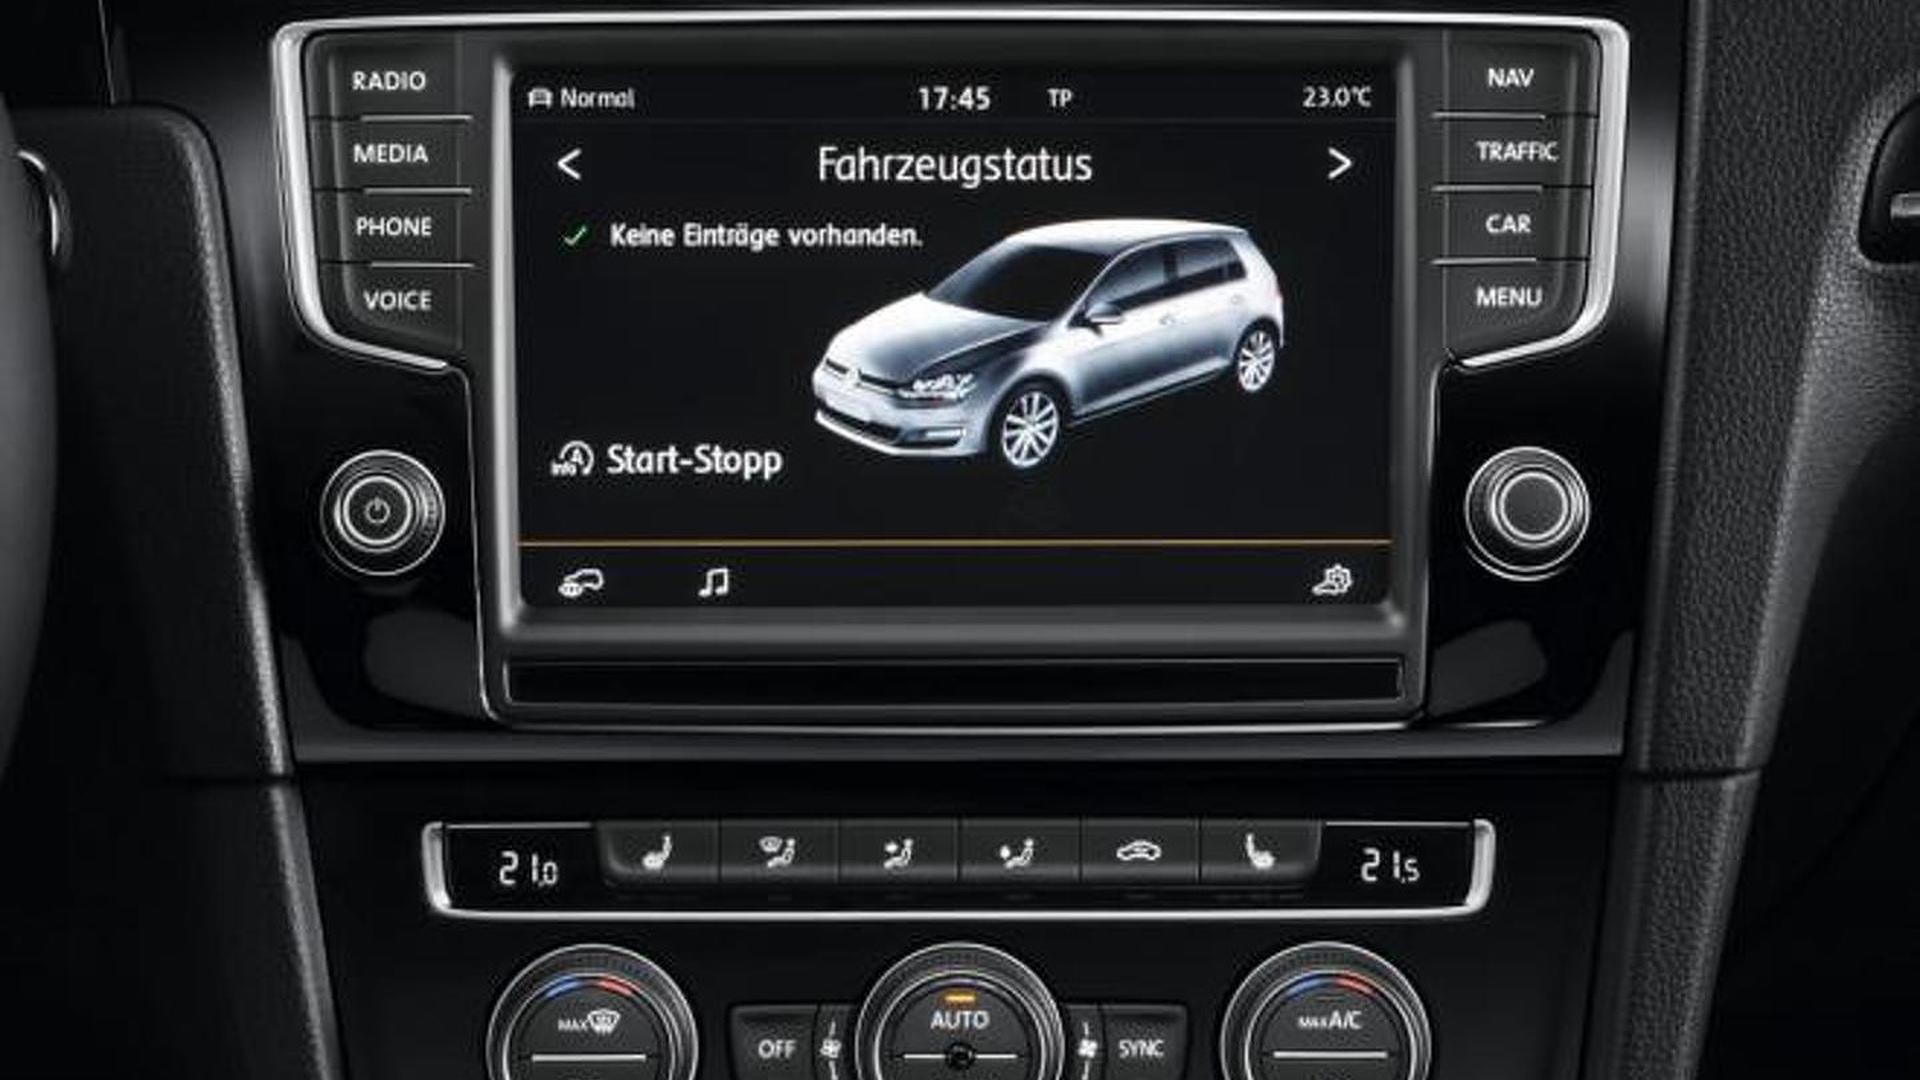 volkswagen confirms car net infotainment system in u s. Black Bedroom Furniture Sets. Home Design Ideas